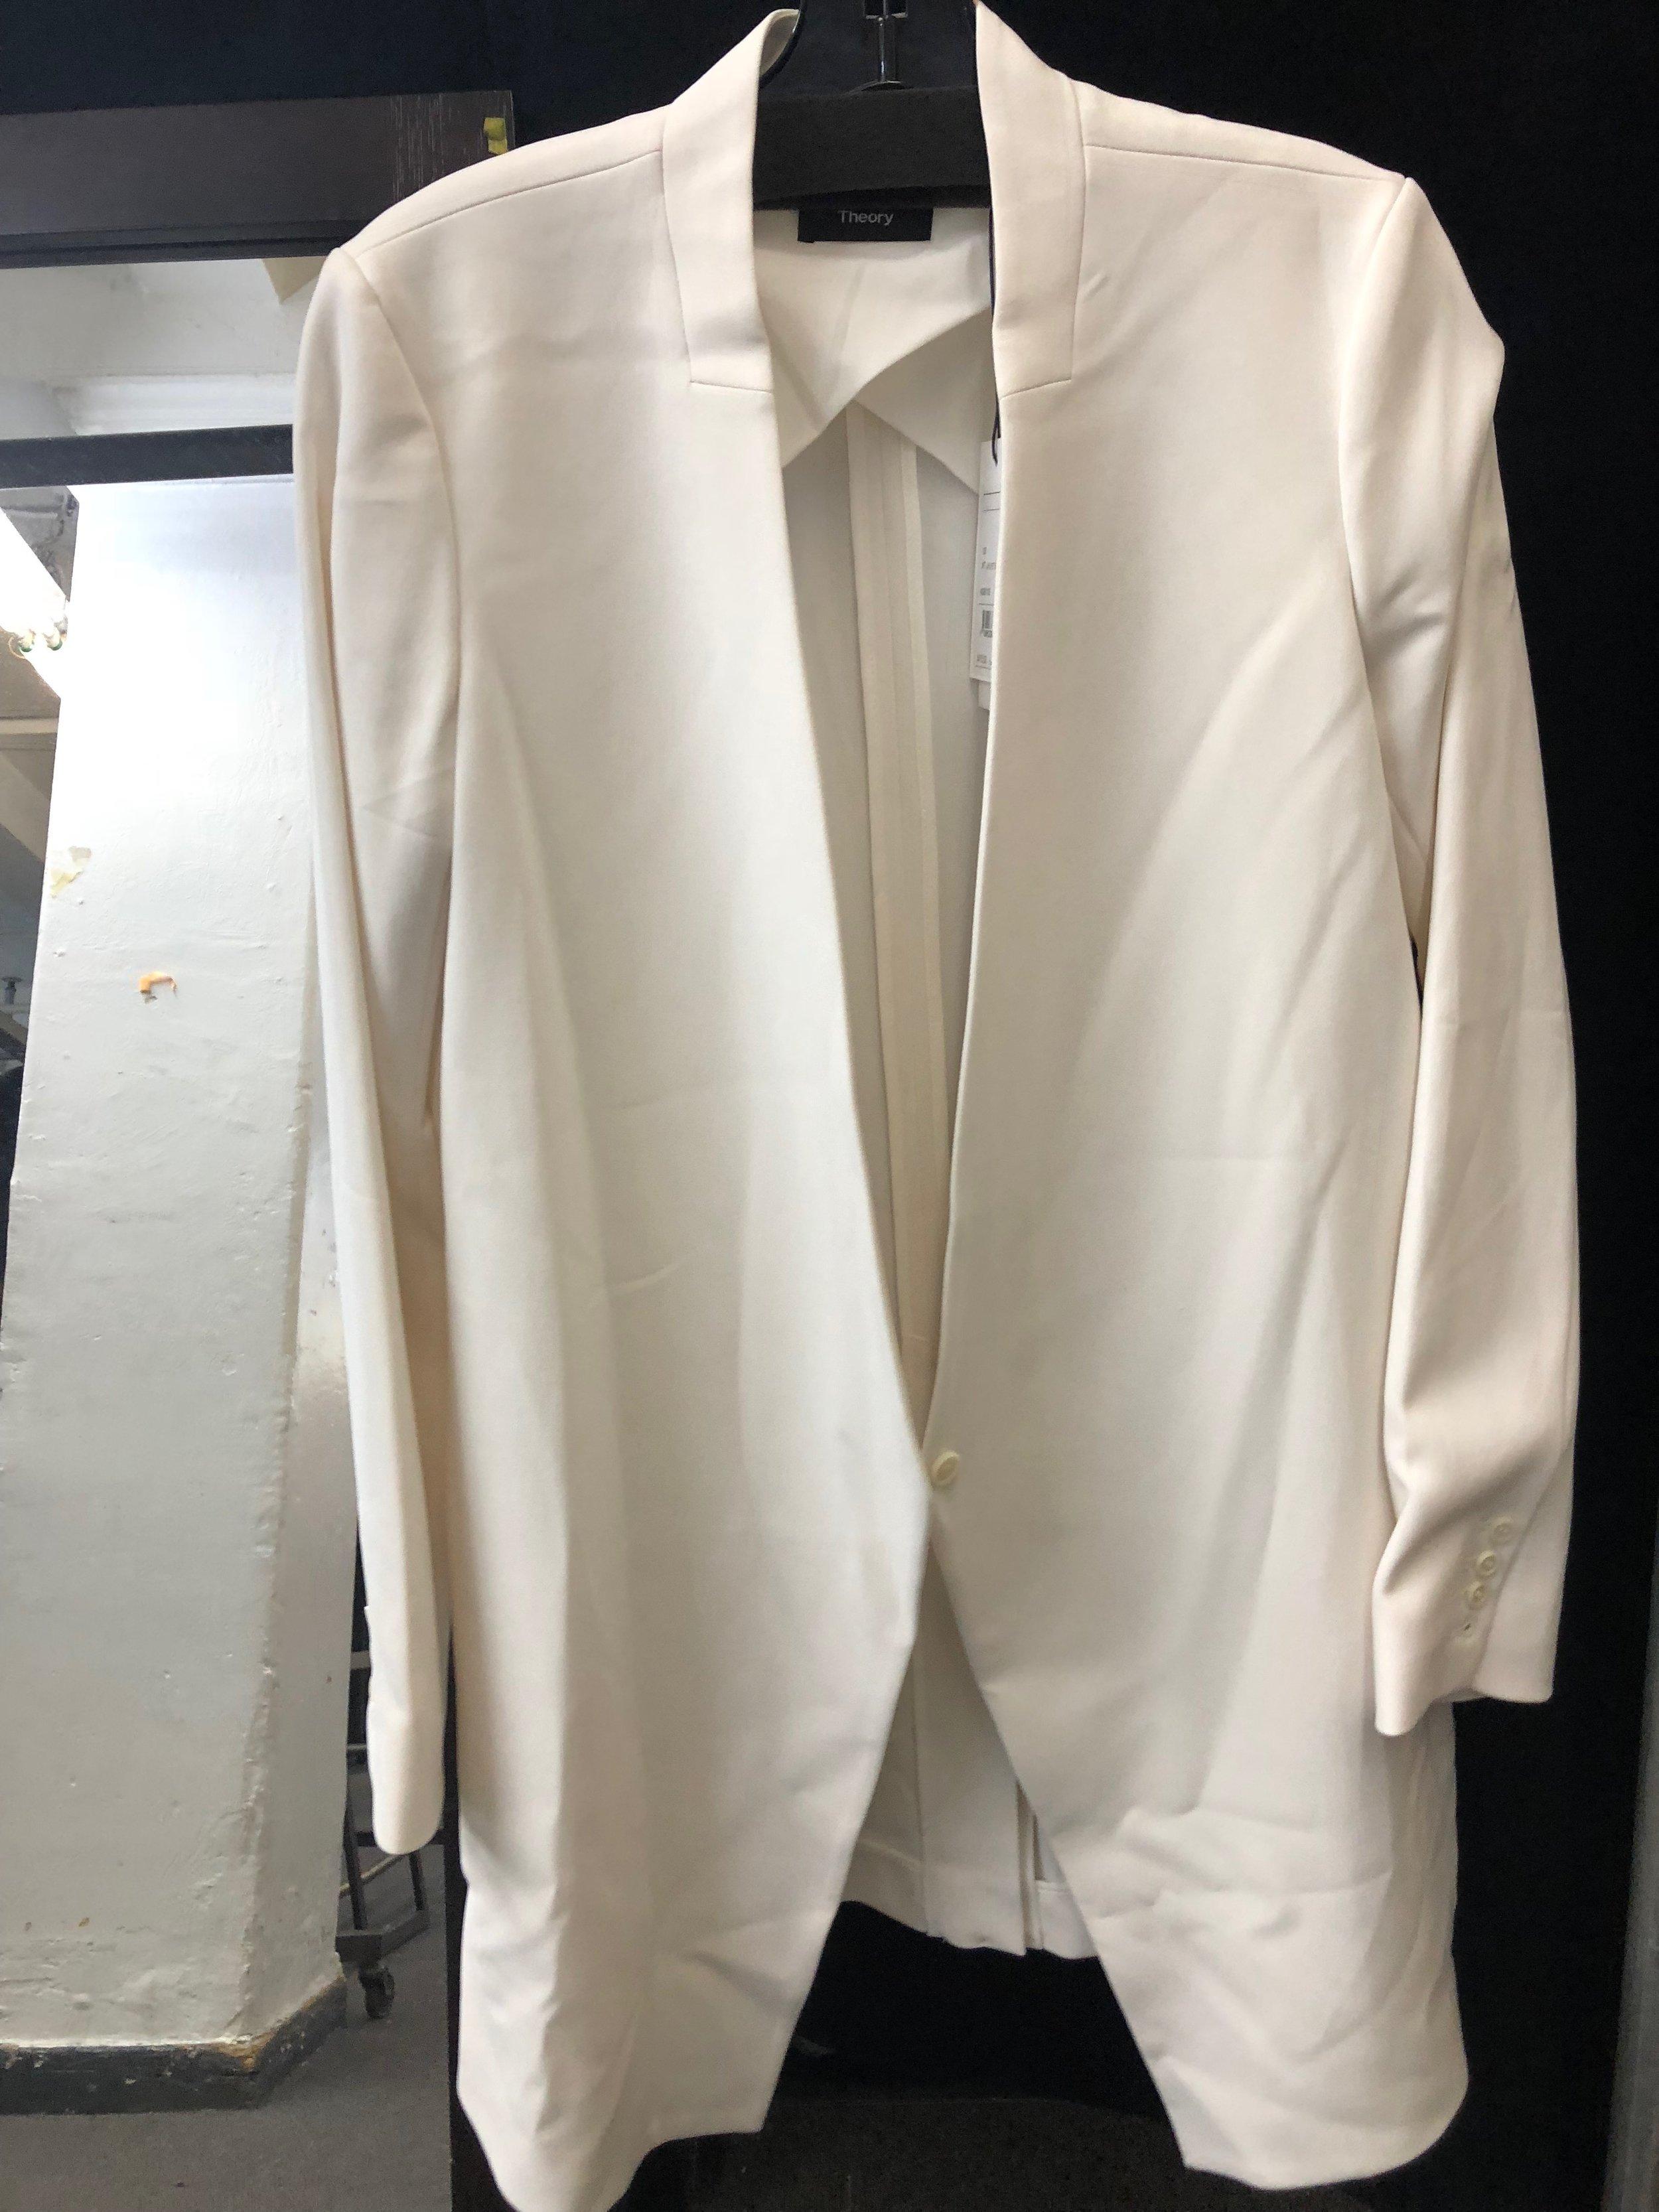 e6b6c4e282 Shop Theory White Long Blazer from Theory + Helmut Lang January 2018 ...